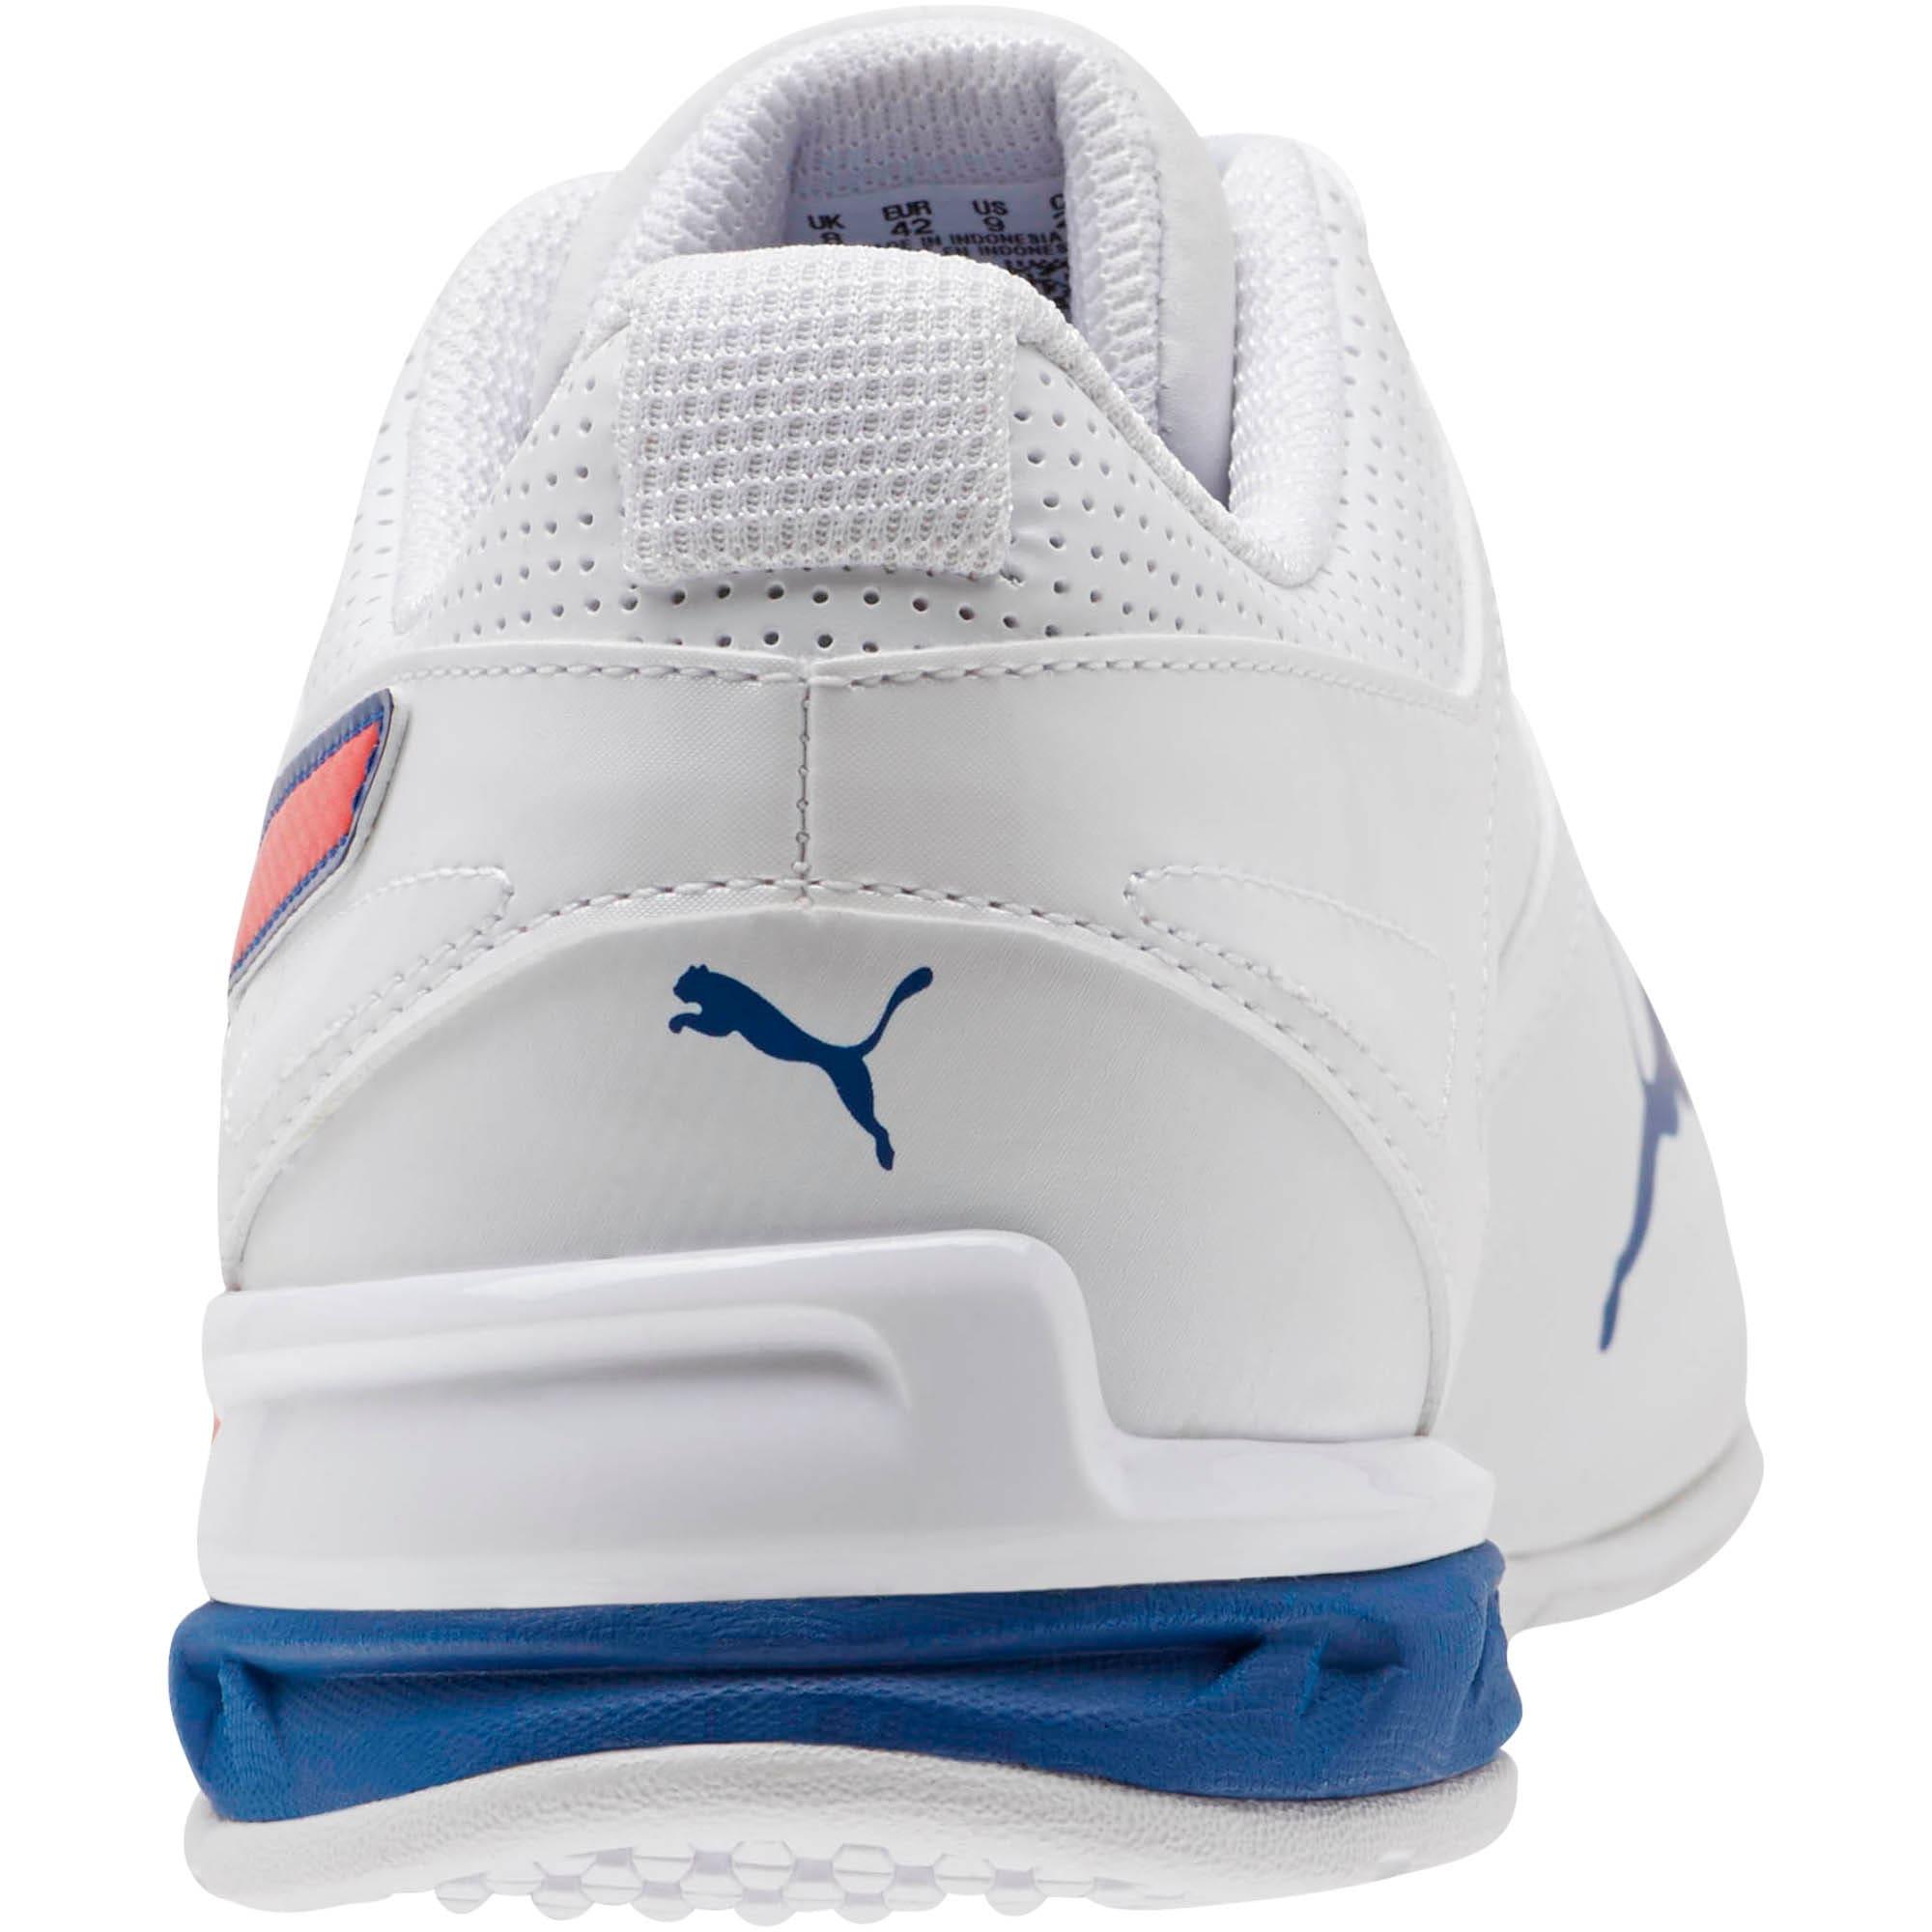 Thumbnail 3 of Tazon 6 FM Men's Sneakers, P White-Glaxy Blue-H Risk Rd, medium